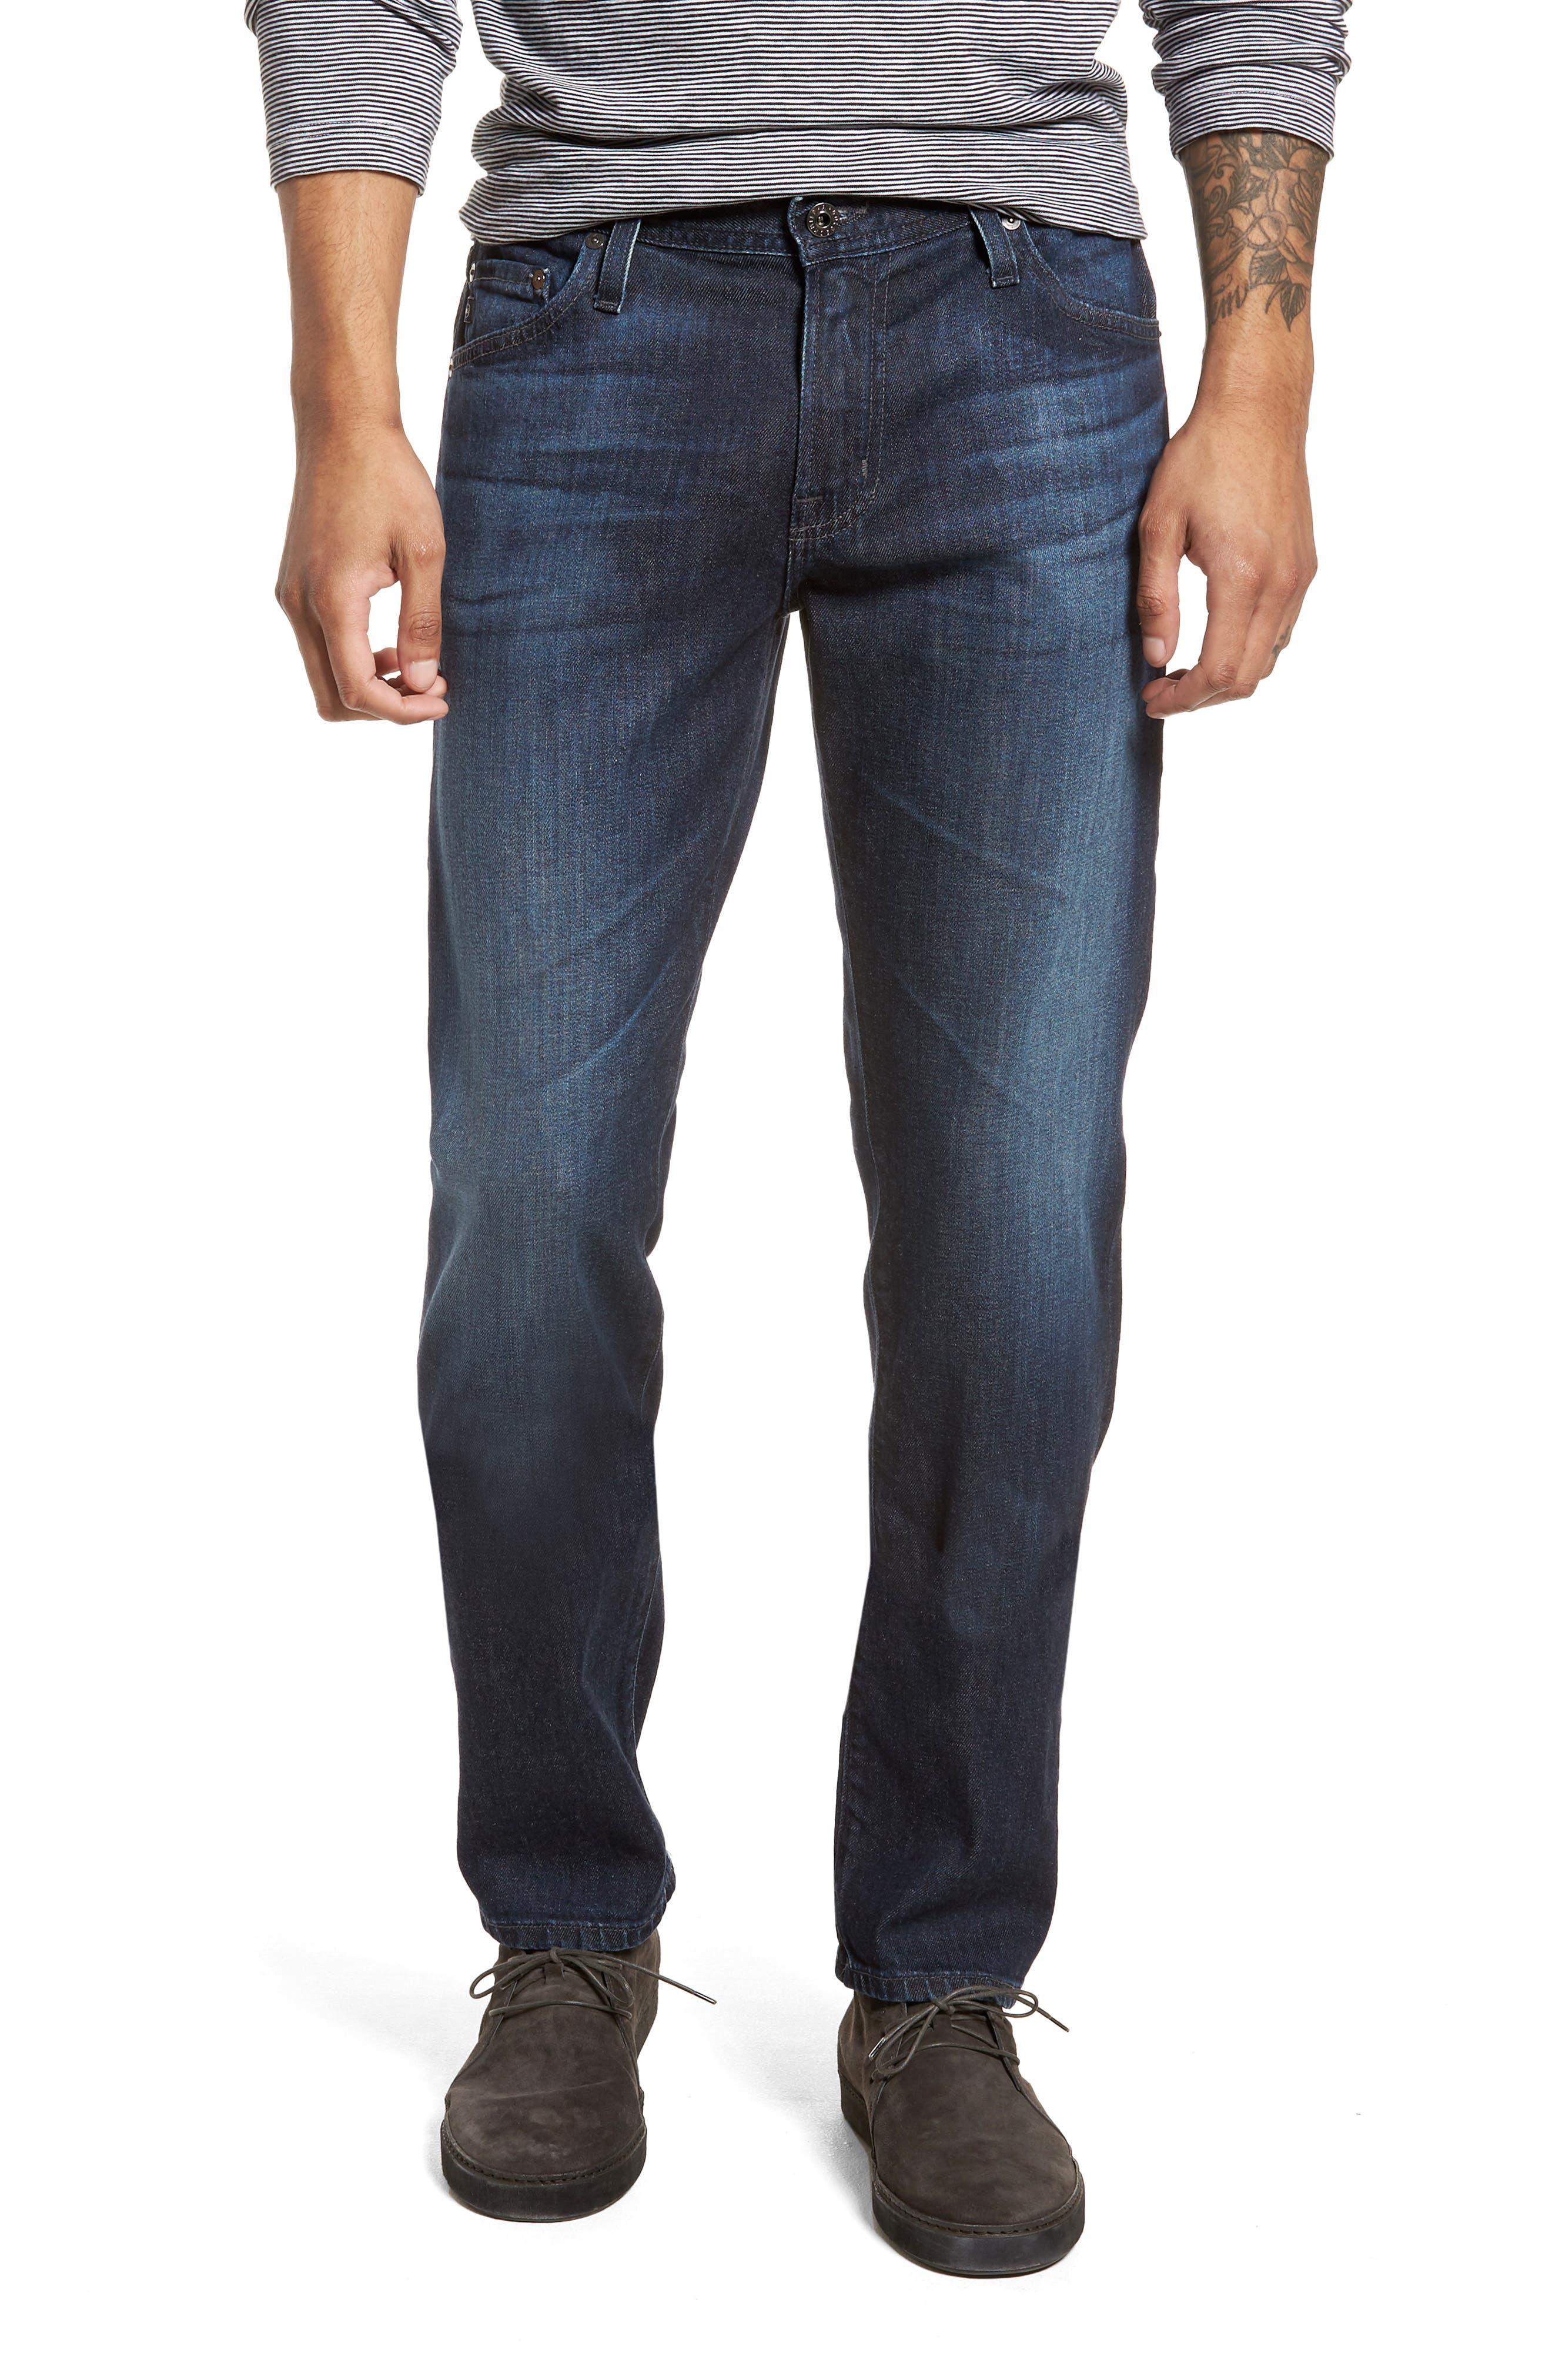 Graduate Slim Straight Leg Jeans,                             Main thumbnail 1, color,                             Stafford